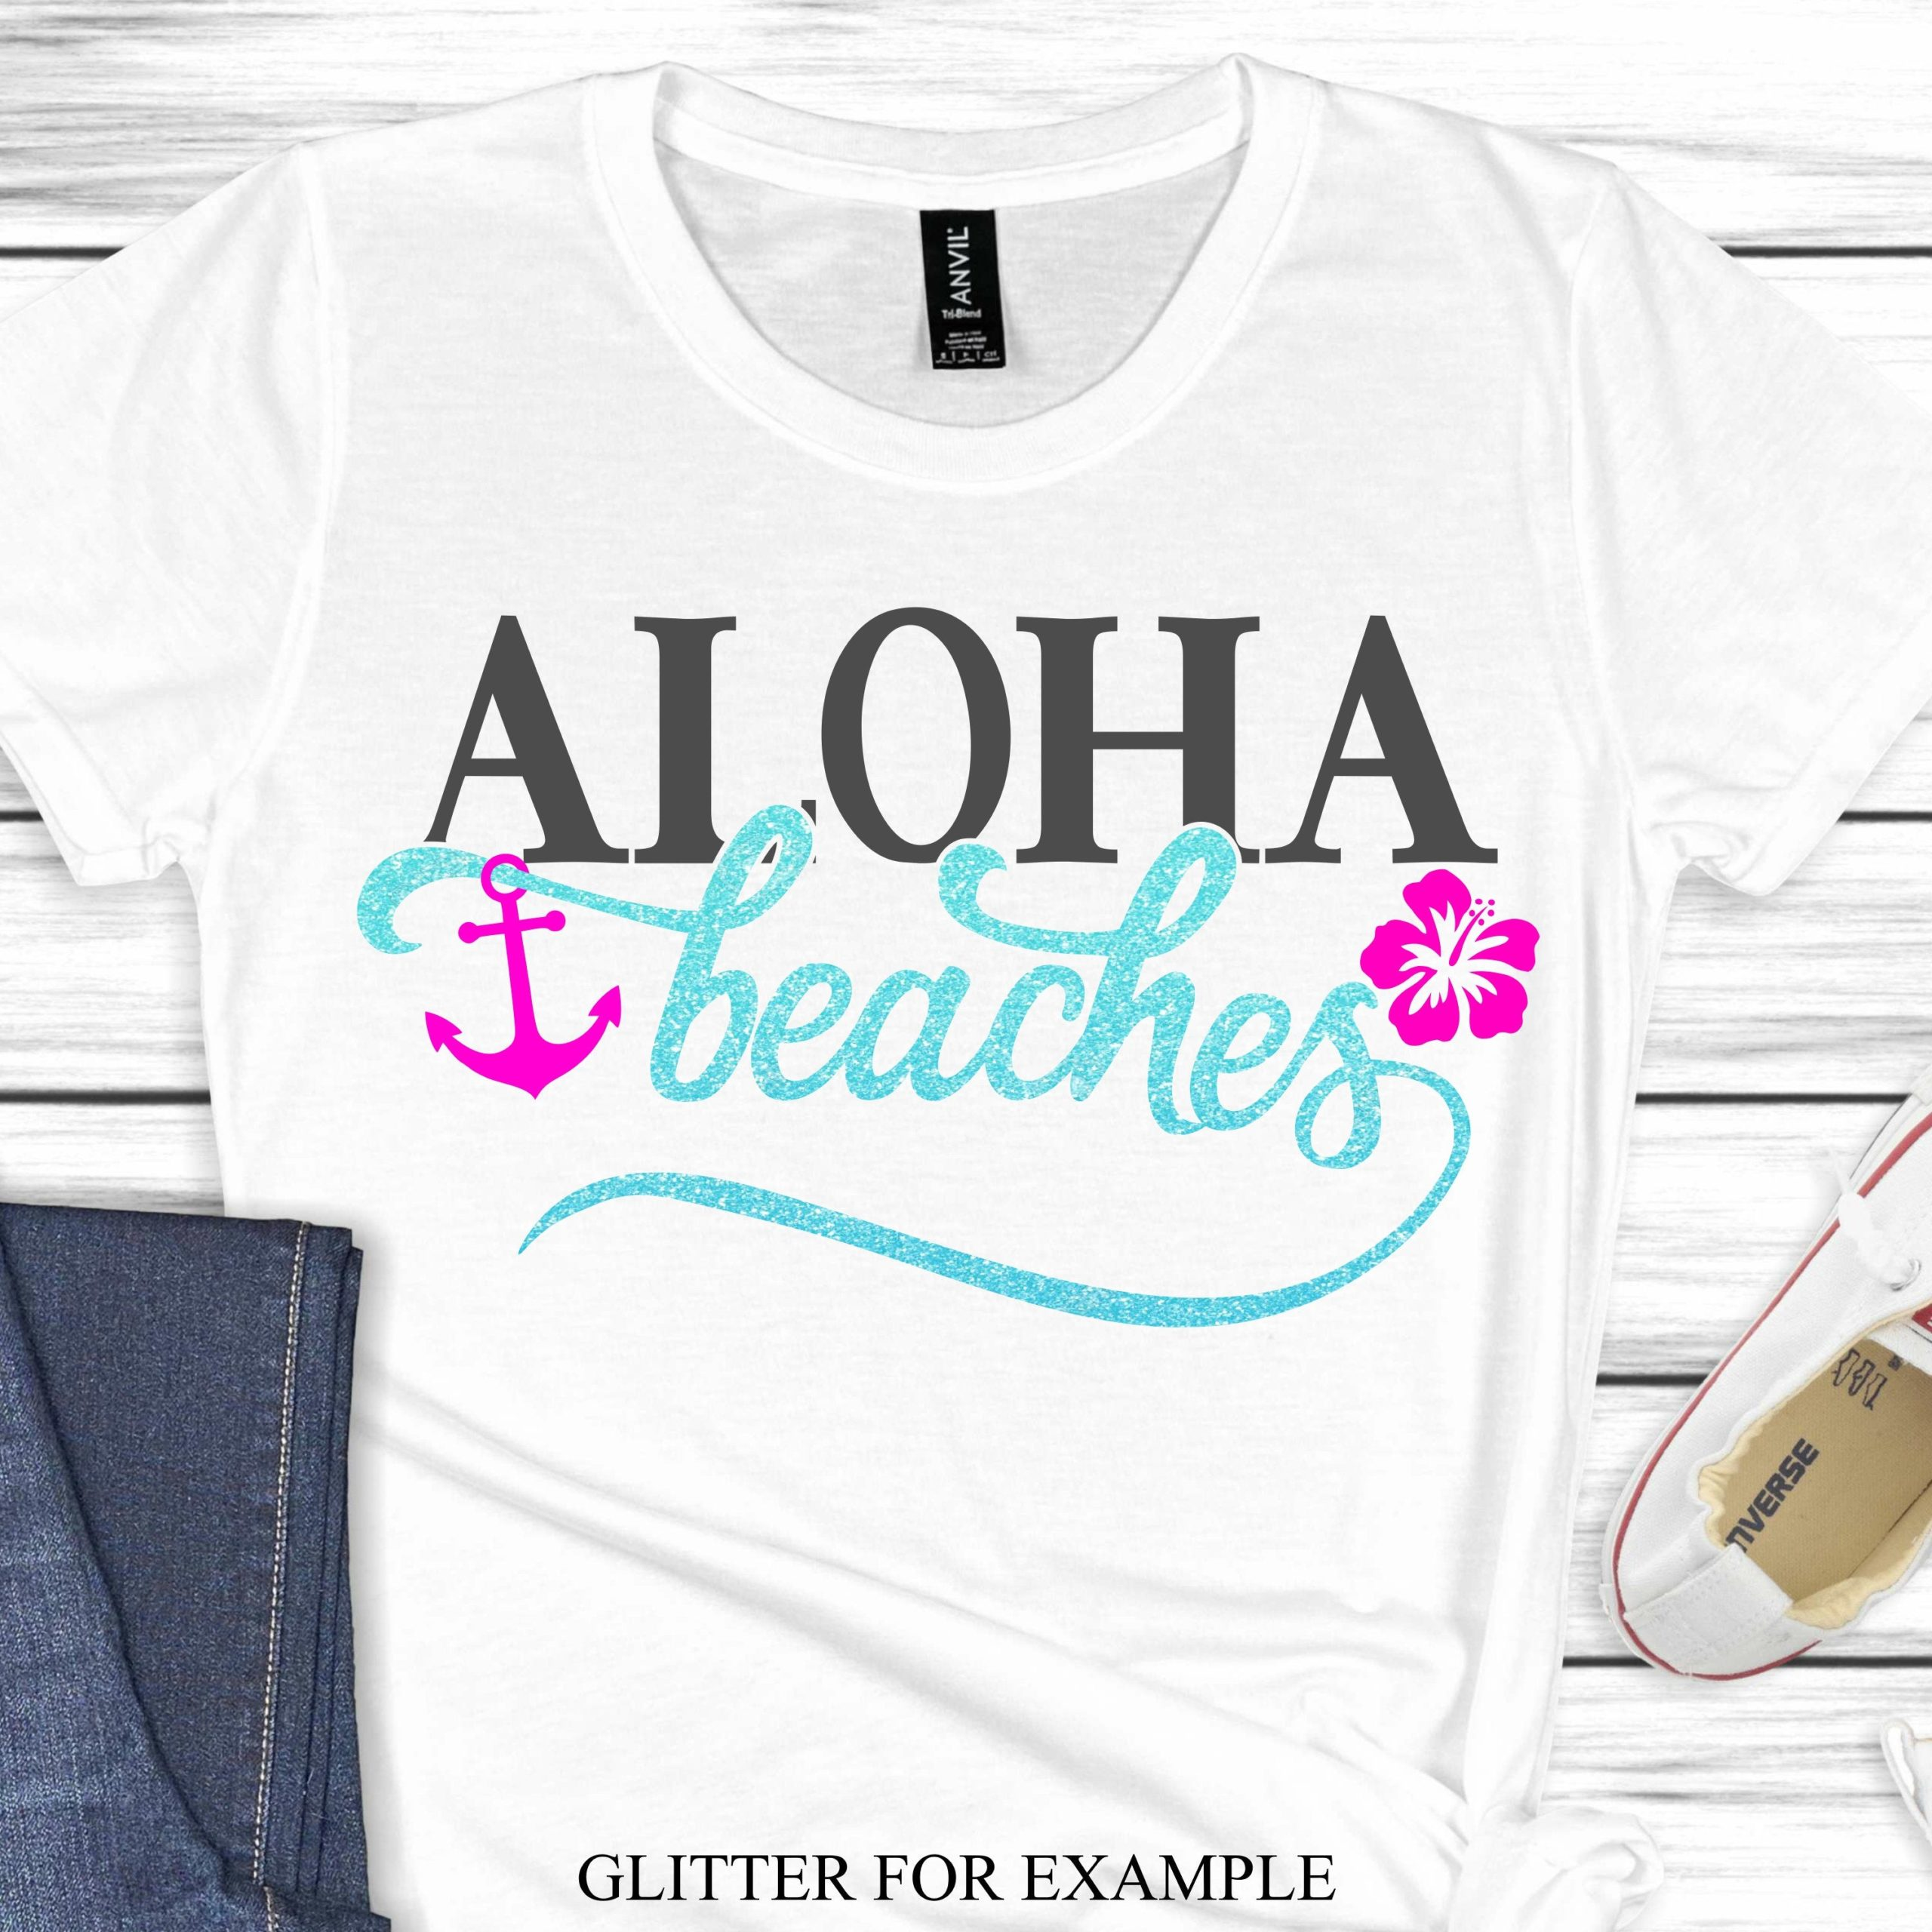 Aloha-beaches-svg-beach-svg-palm-tree-svg-summer-svg-summertime-svgbeach-life-svg-beachy-svg-for-cricut-retro-beach-svg-5ef78d5c